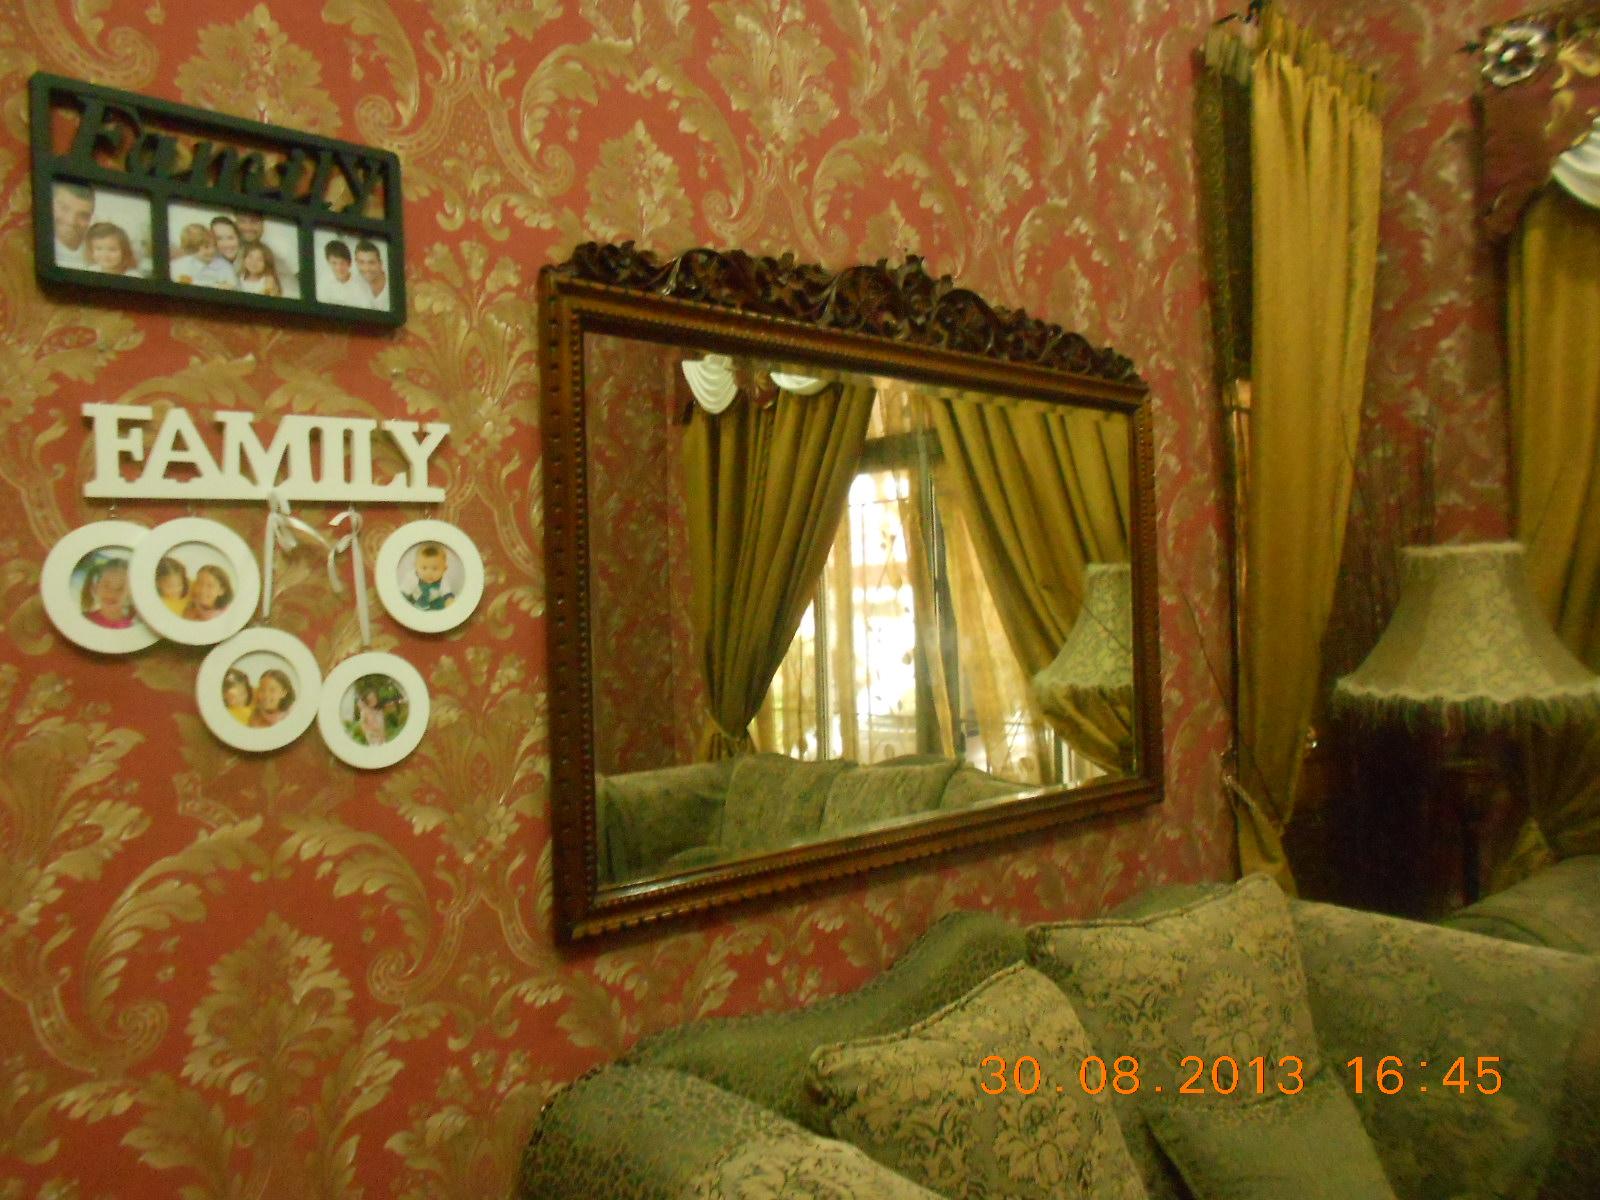 Repair Sofa Shah Alam Southern Motion Reclining Reviews Rumah 3 Tingkat Dengan Wallpaper Mewah Baiti Jannati Deco